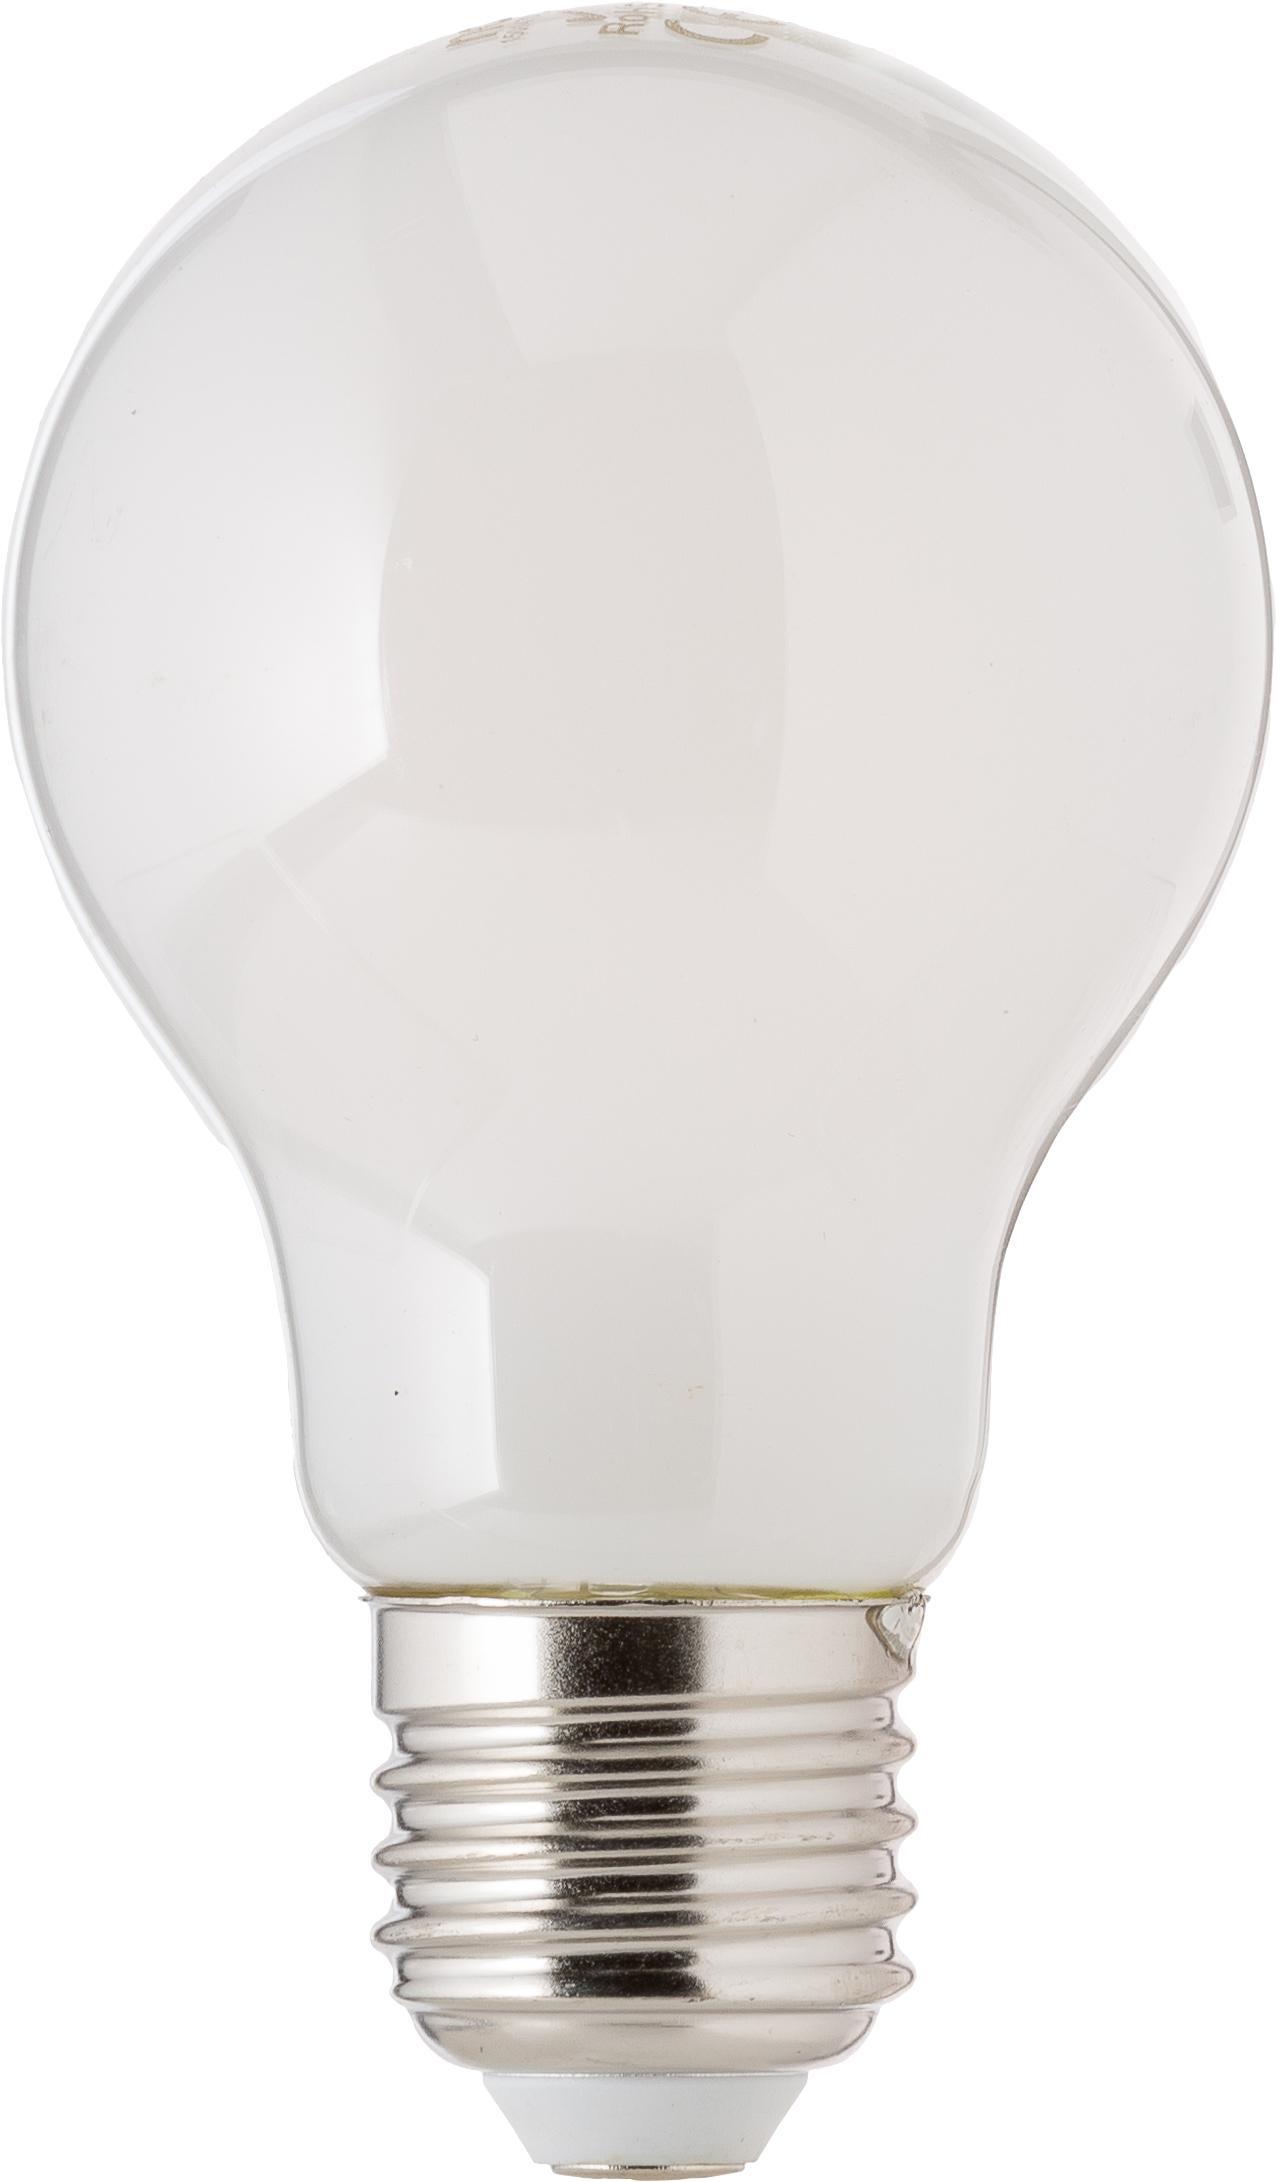 Lampadina a LED dimmerabile Bafa (E27 / 8,3 Watt) 3 pz, Paralume: materiale sintetico, Base lampadina: alluminio, Bianco, Ø 8 x Alt. 10 cm